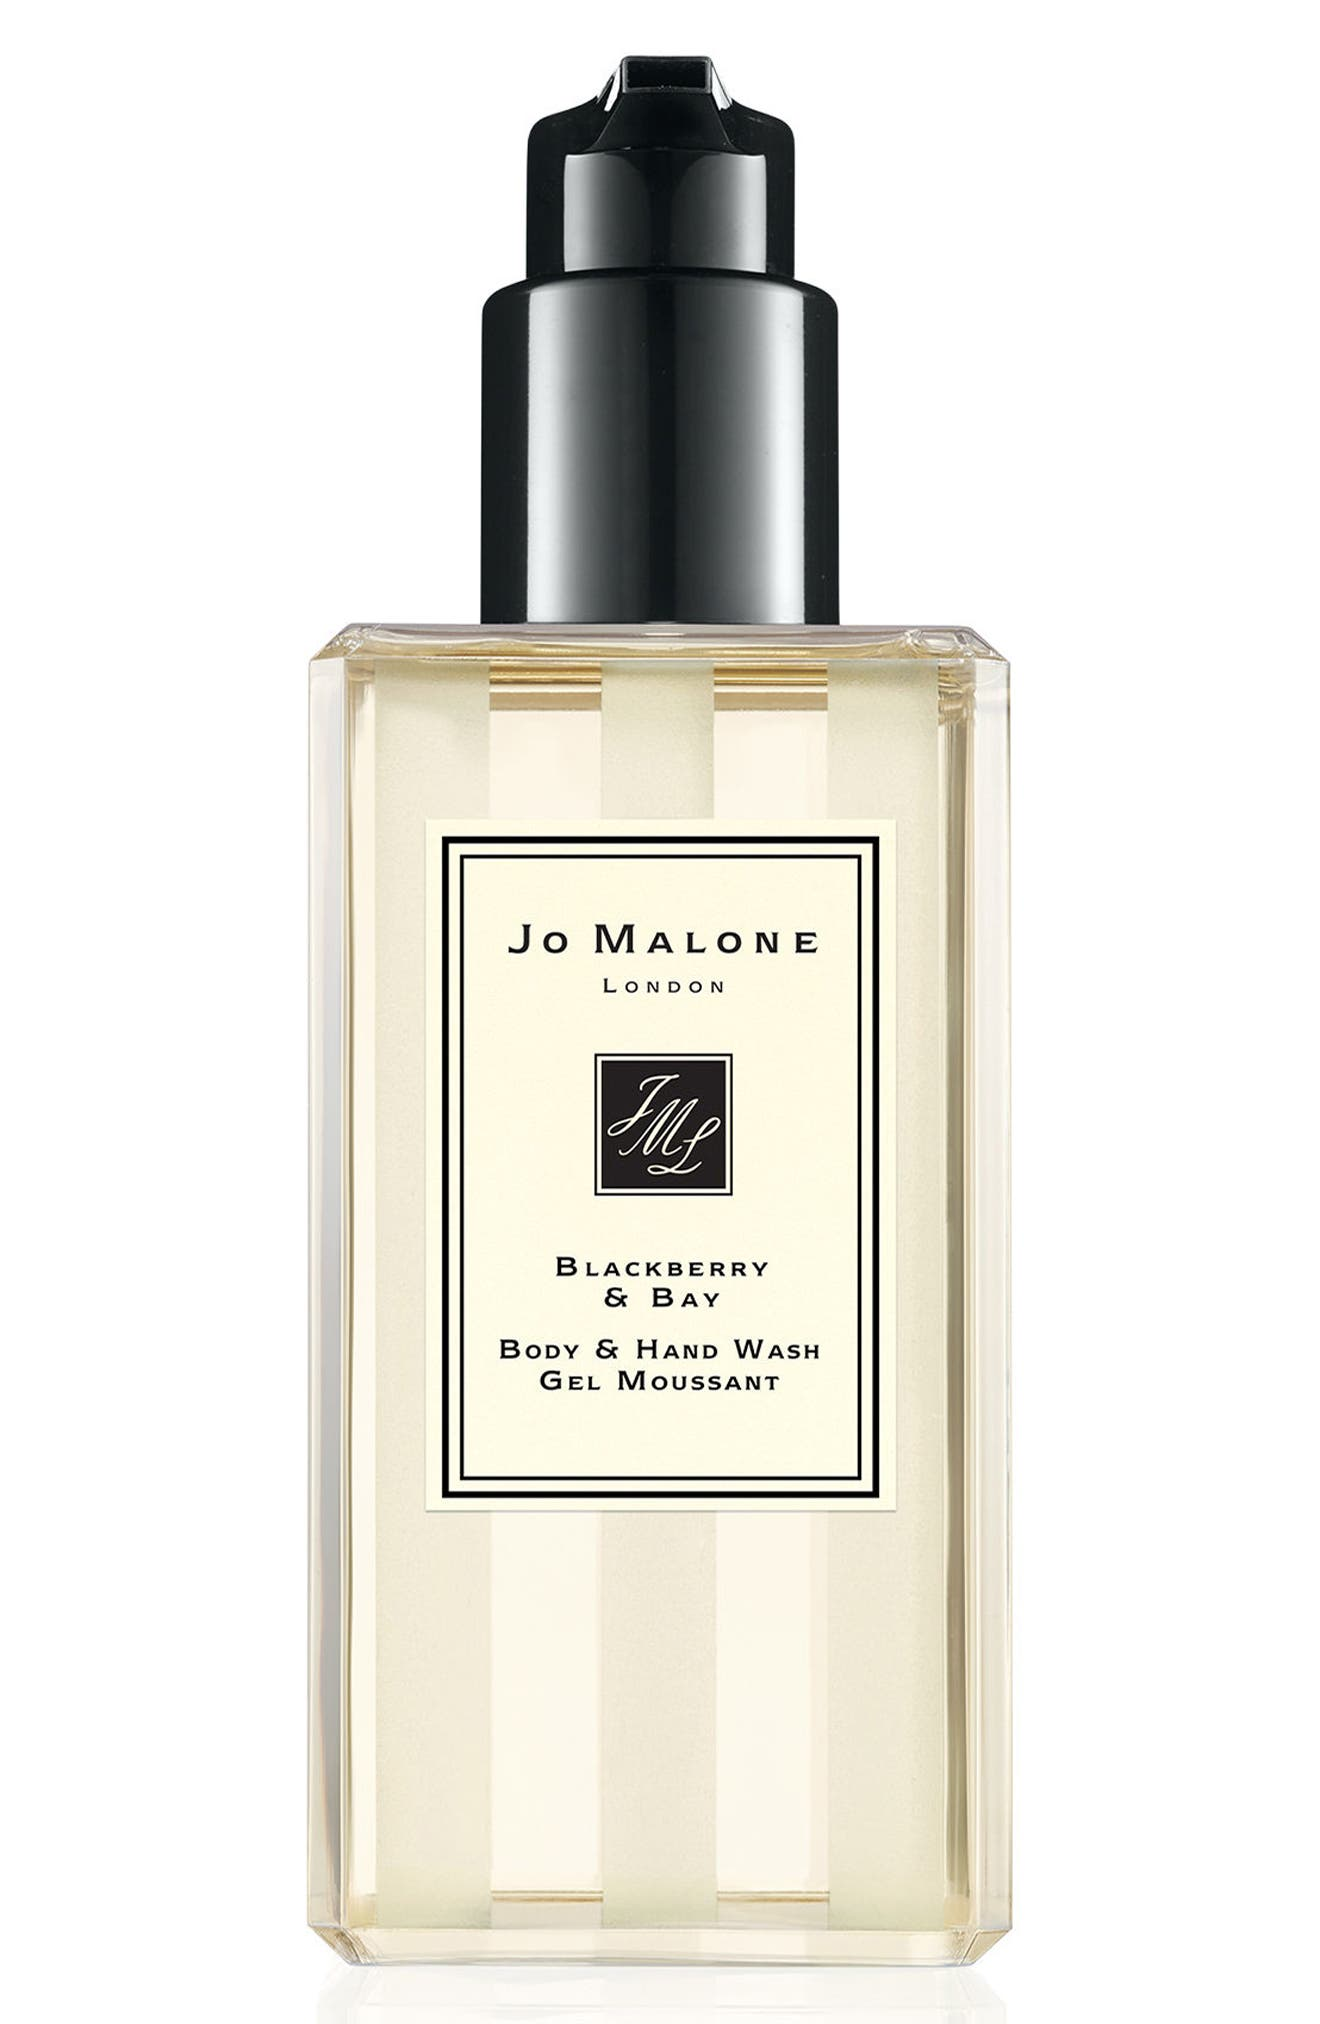 Jo Malone™ Blackberry & Bay Body & Hand Wash